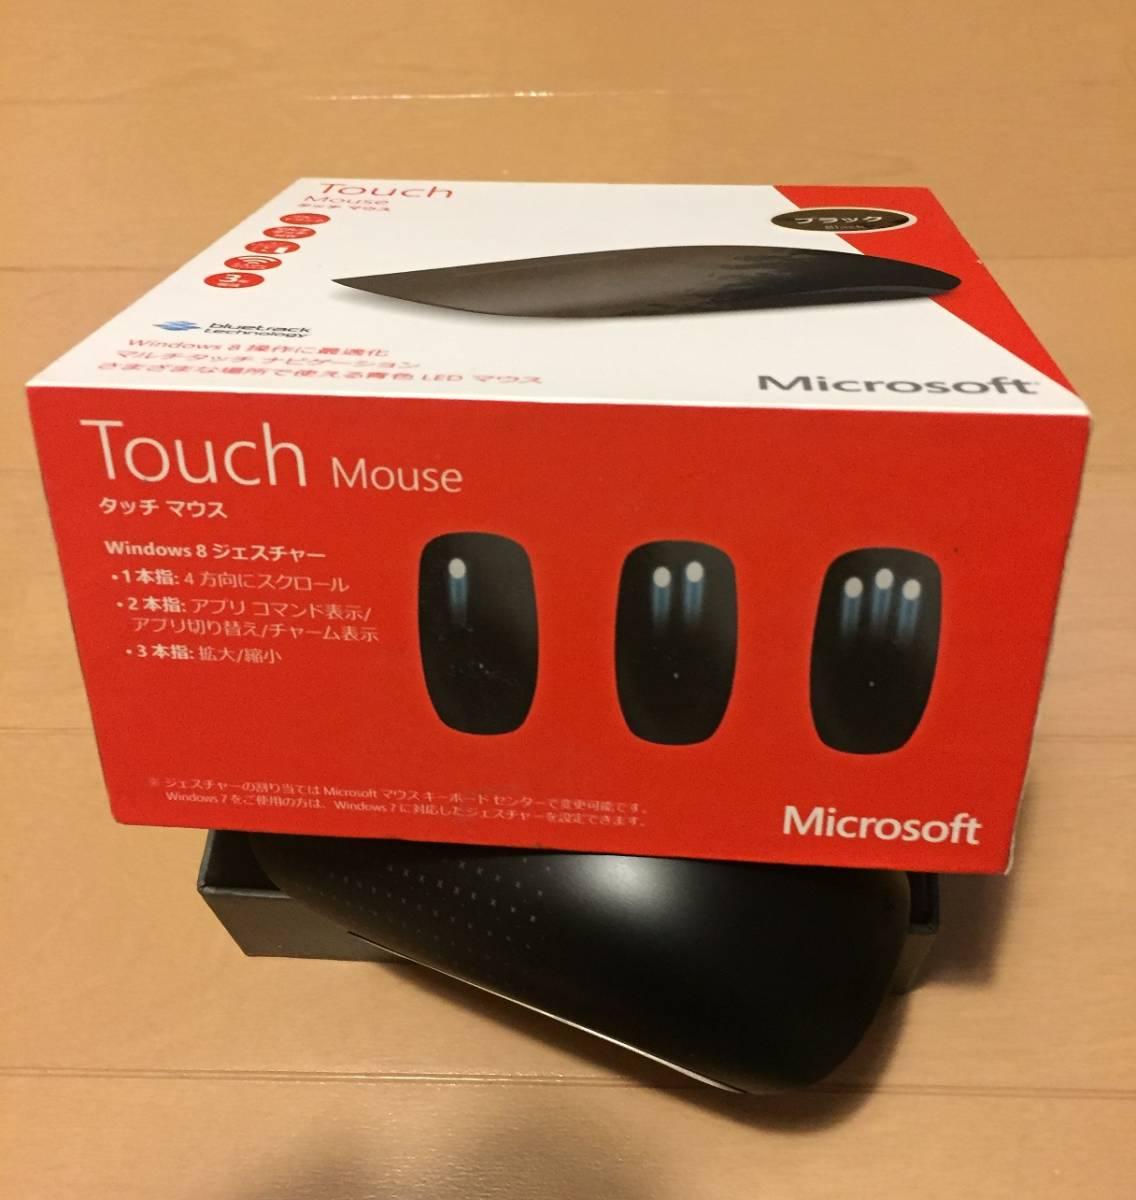 ★Microsoft Touch Mouse マイクロソフト タッチマウス 中古 ブラック ジェスチャー操作★_画像1